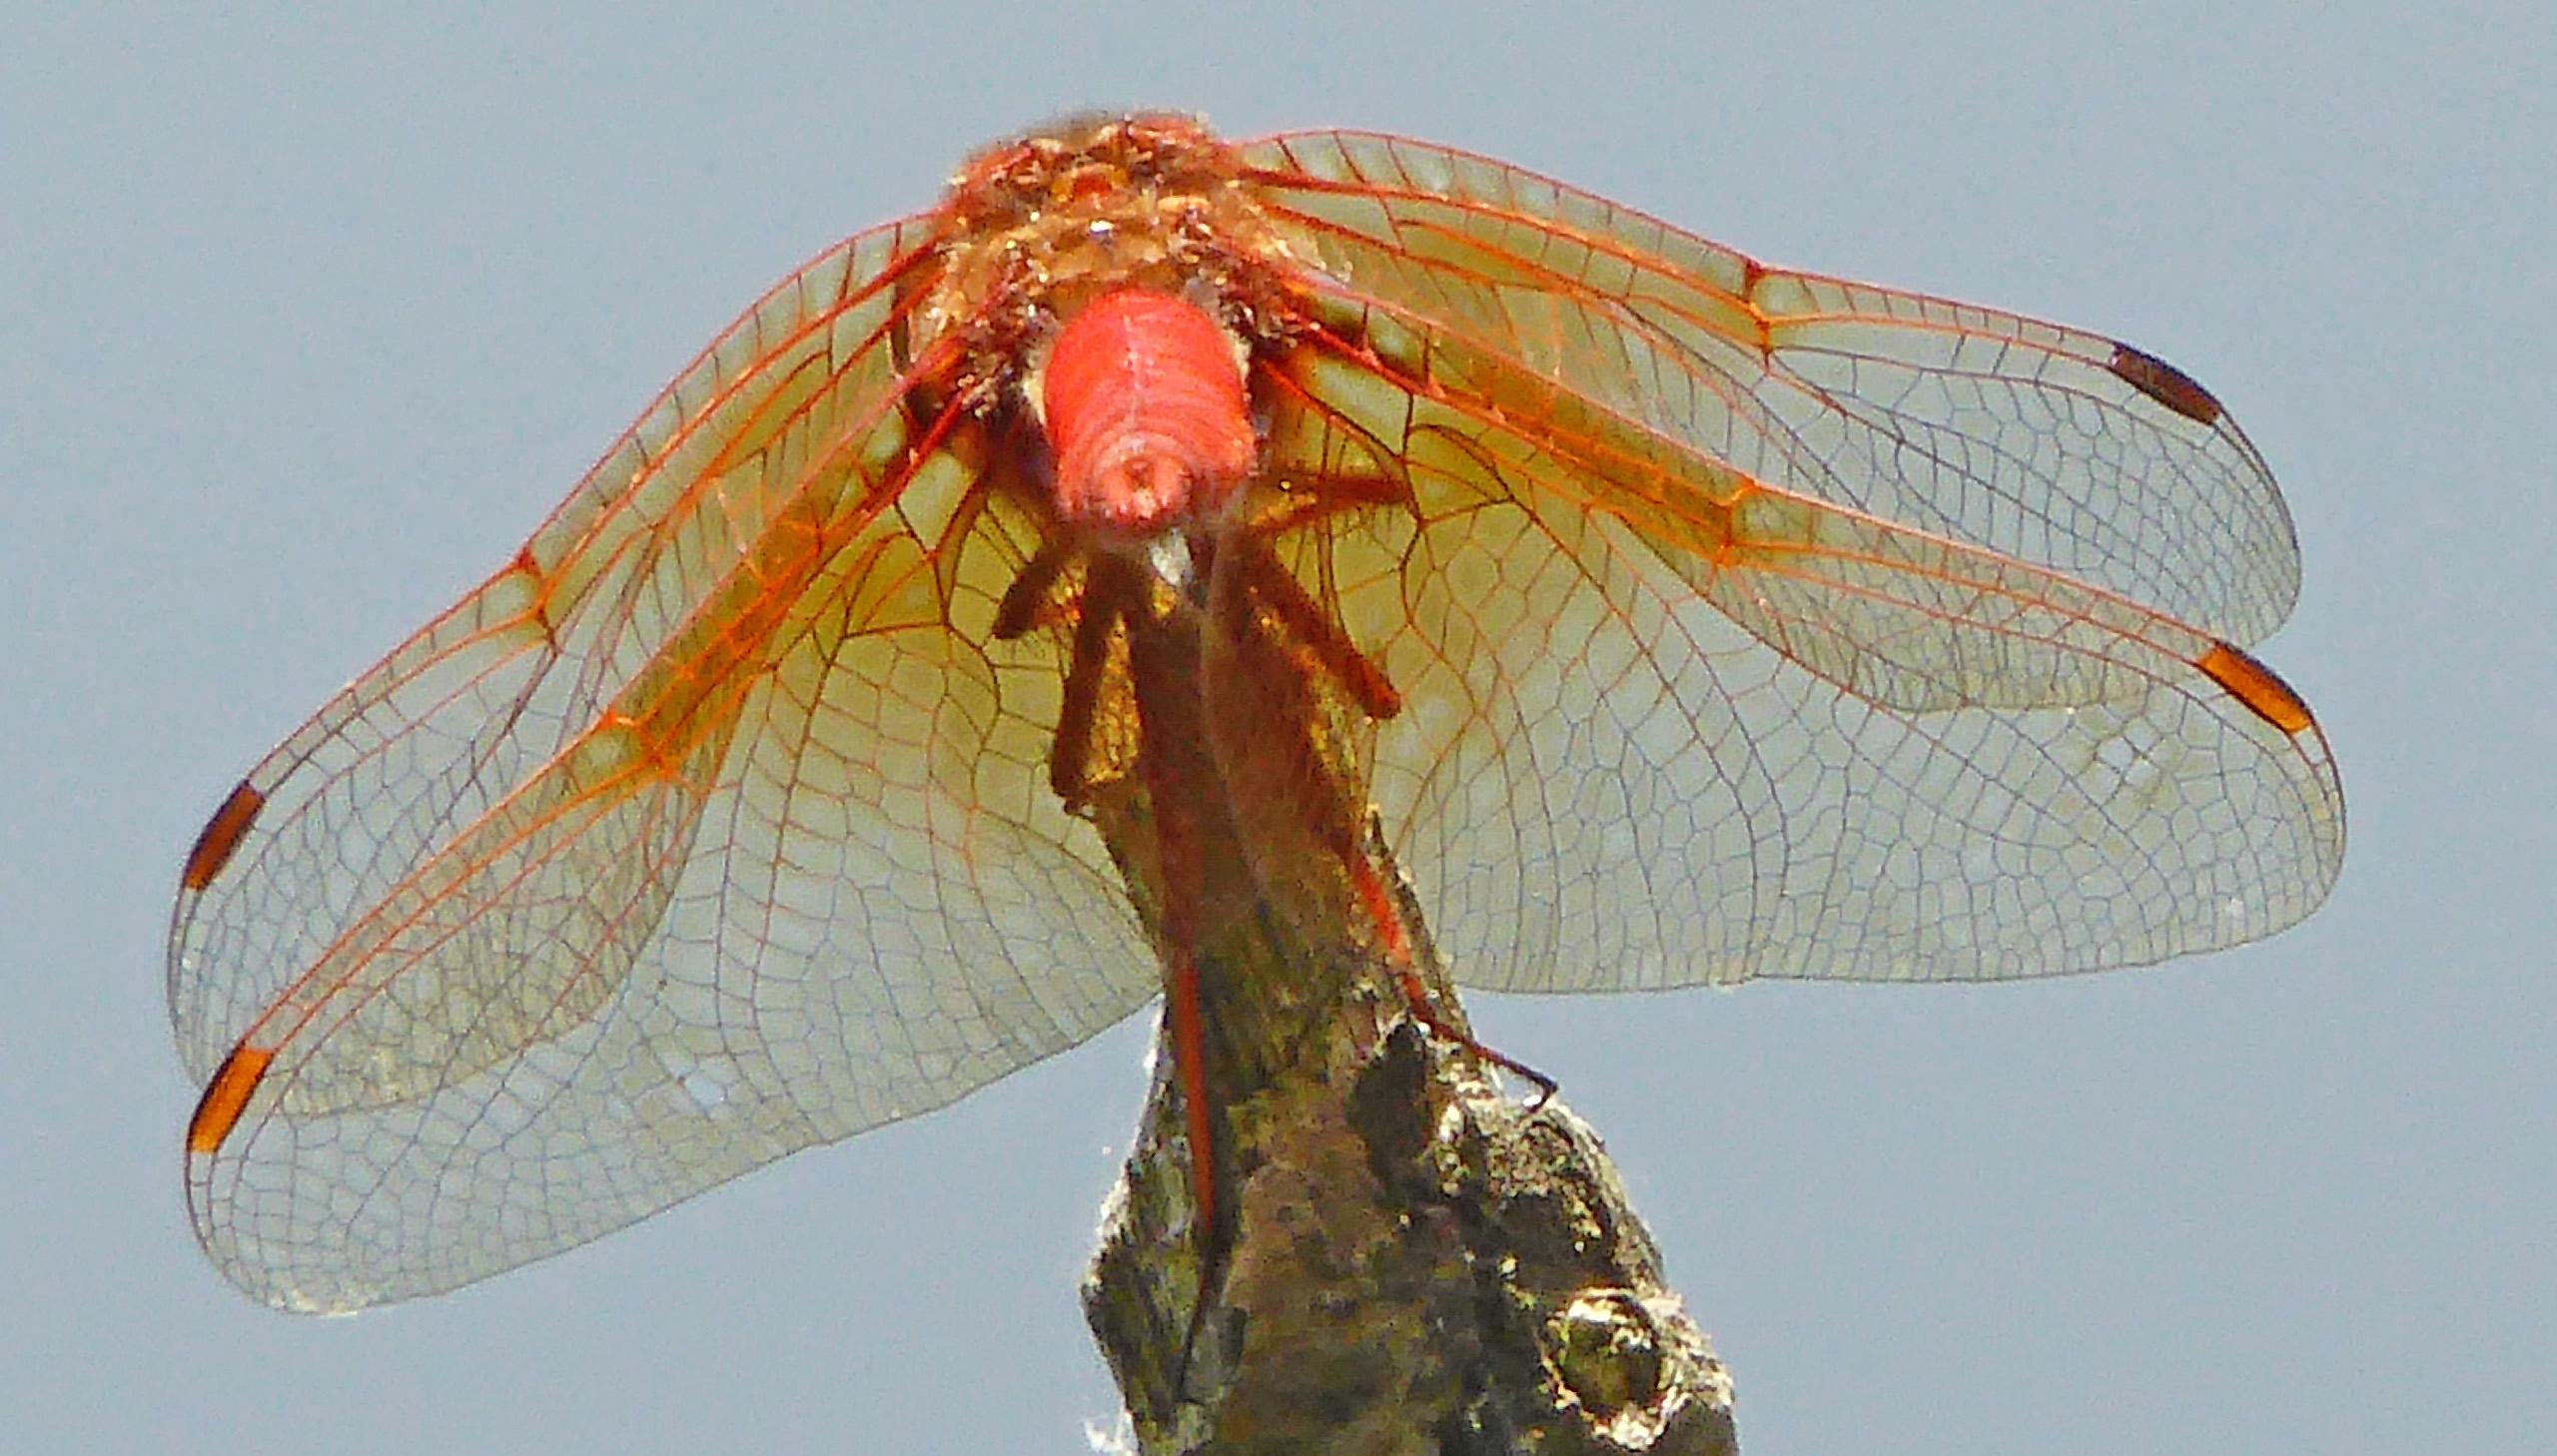 Cardinal Meadowhawk dragonfly